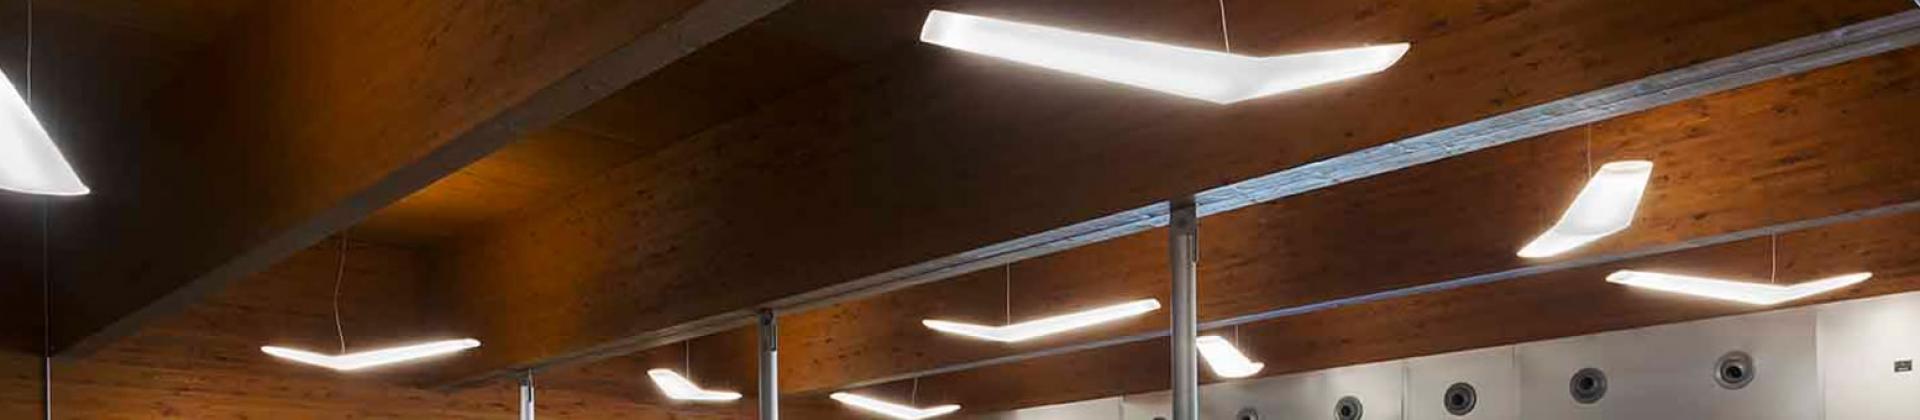 Eric Sole Artemide Architectural - Lámparas de diseño